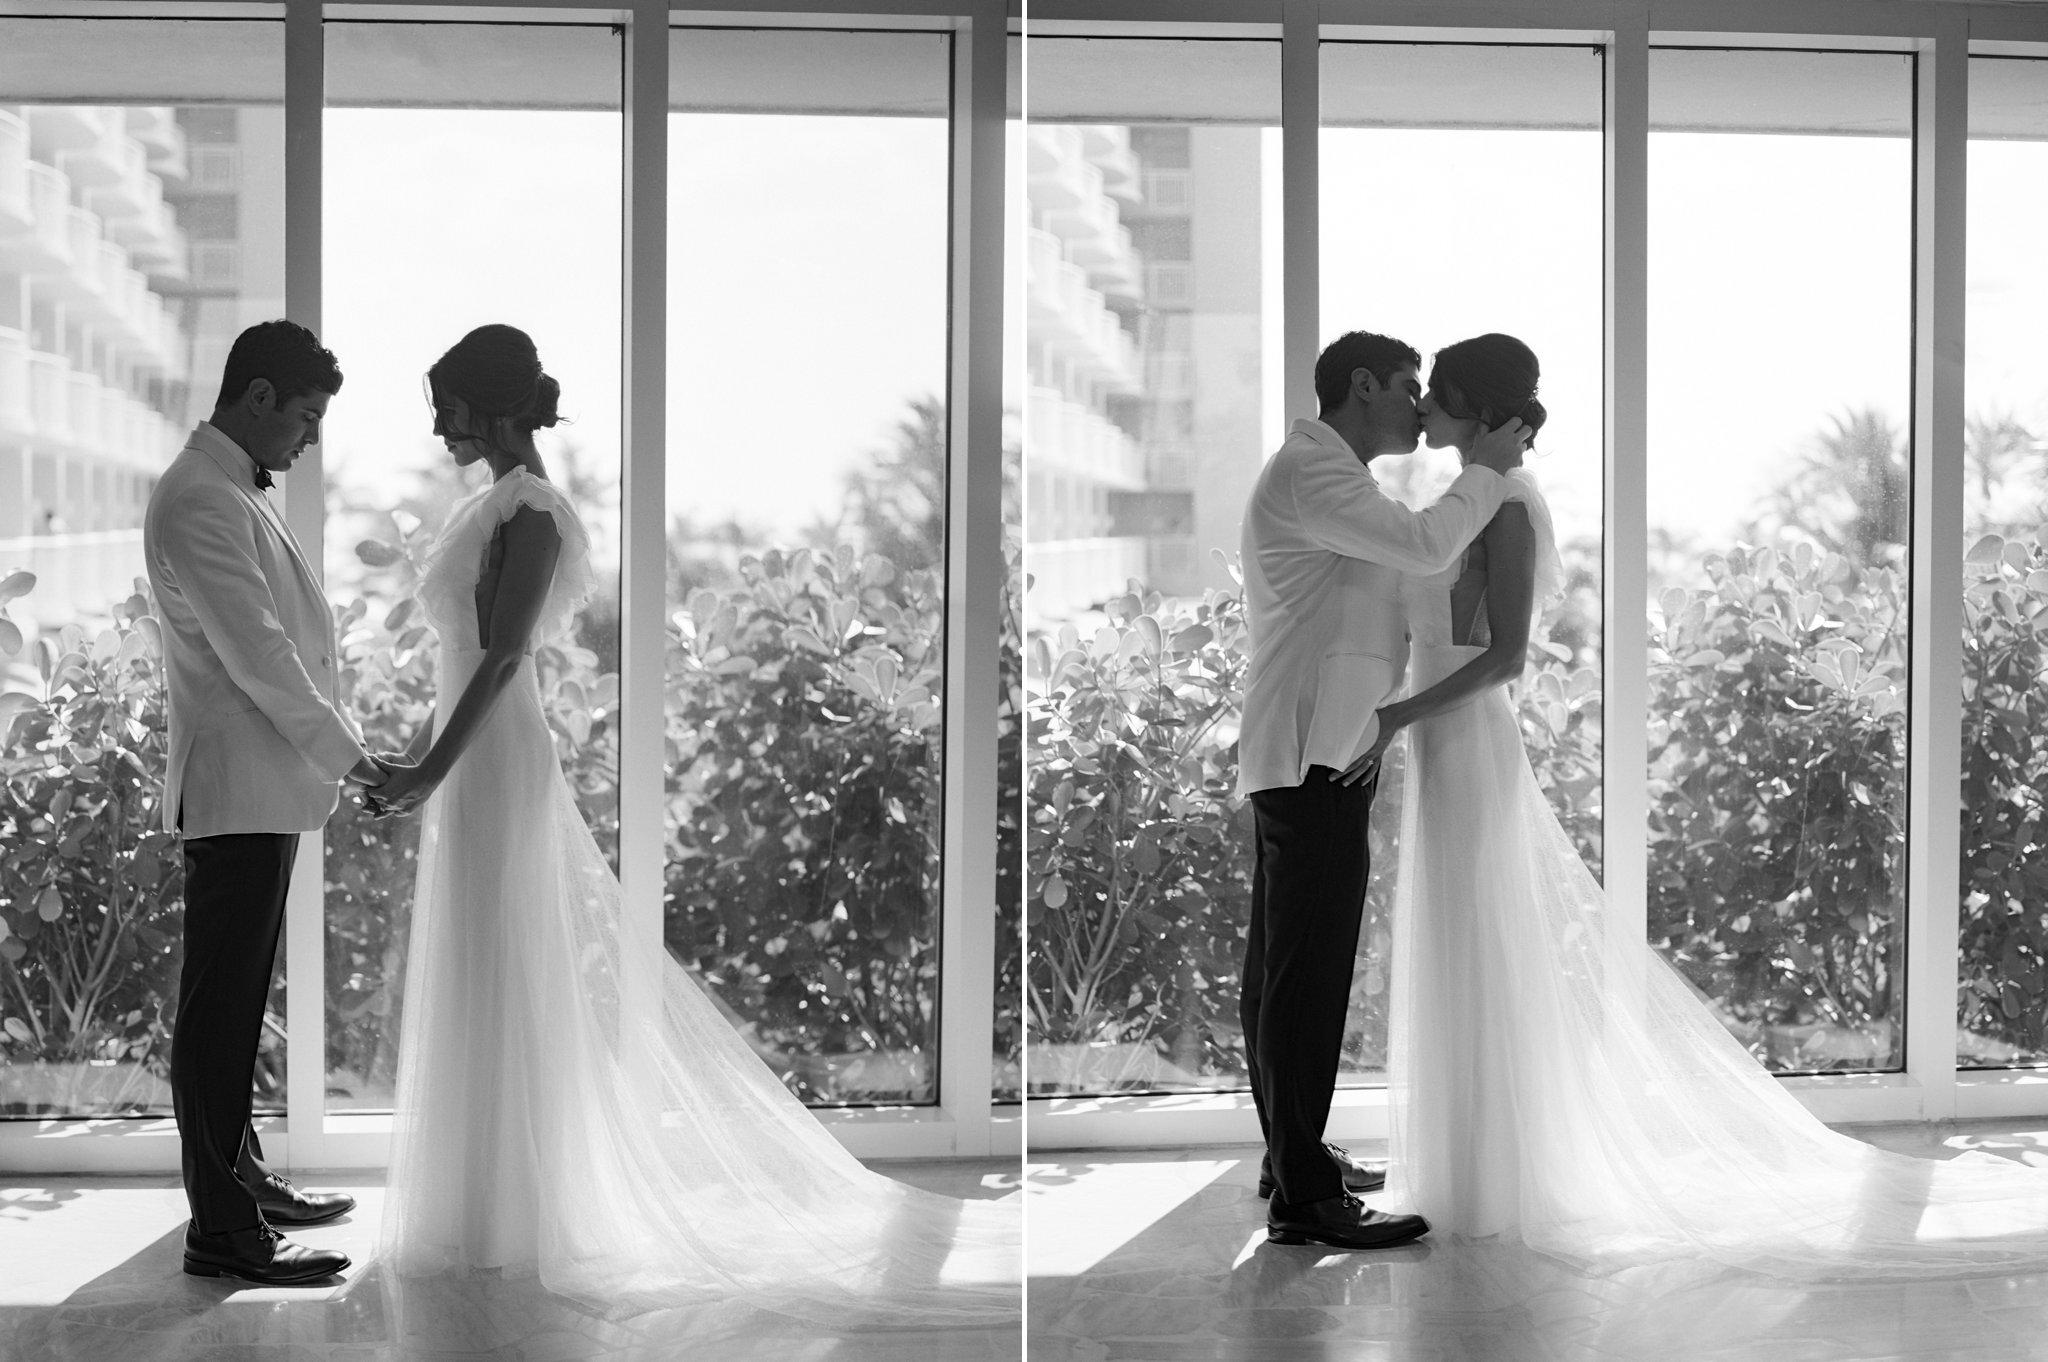 jw marriott marco island wedding photographer marco island wedding photographer shannon griffin photography_0197.jpg